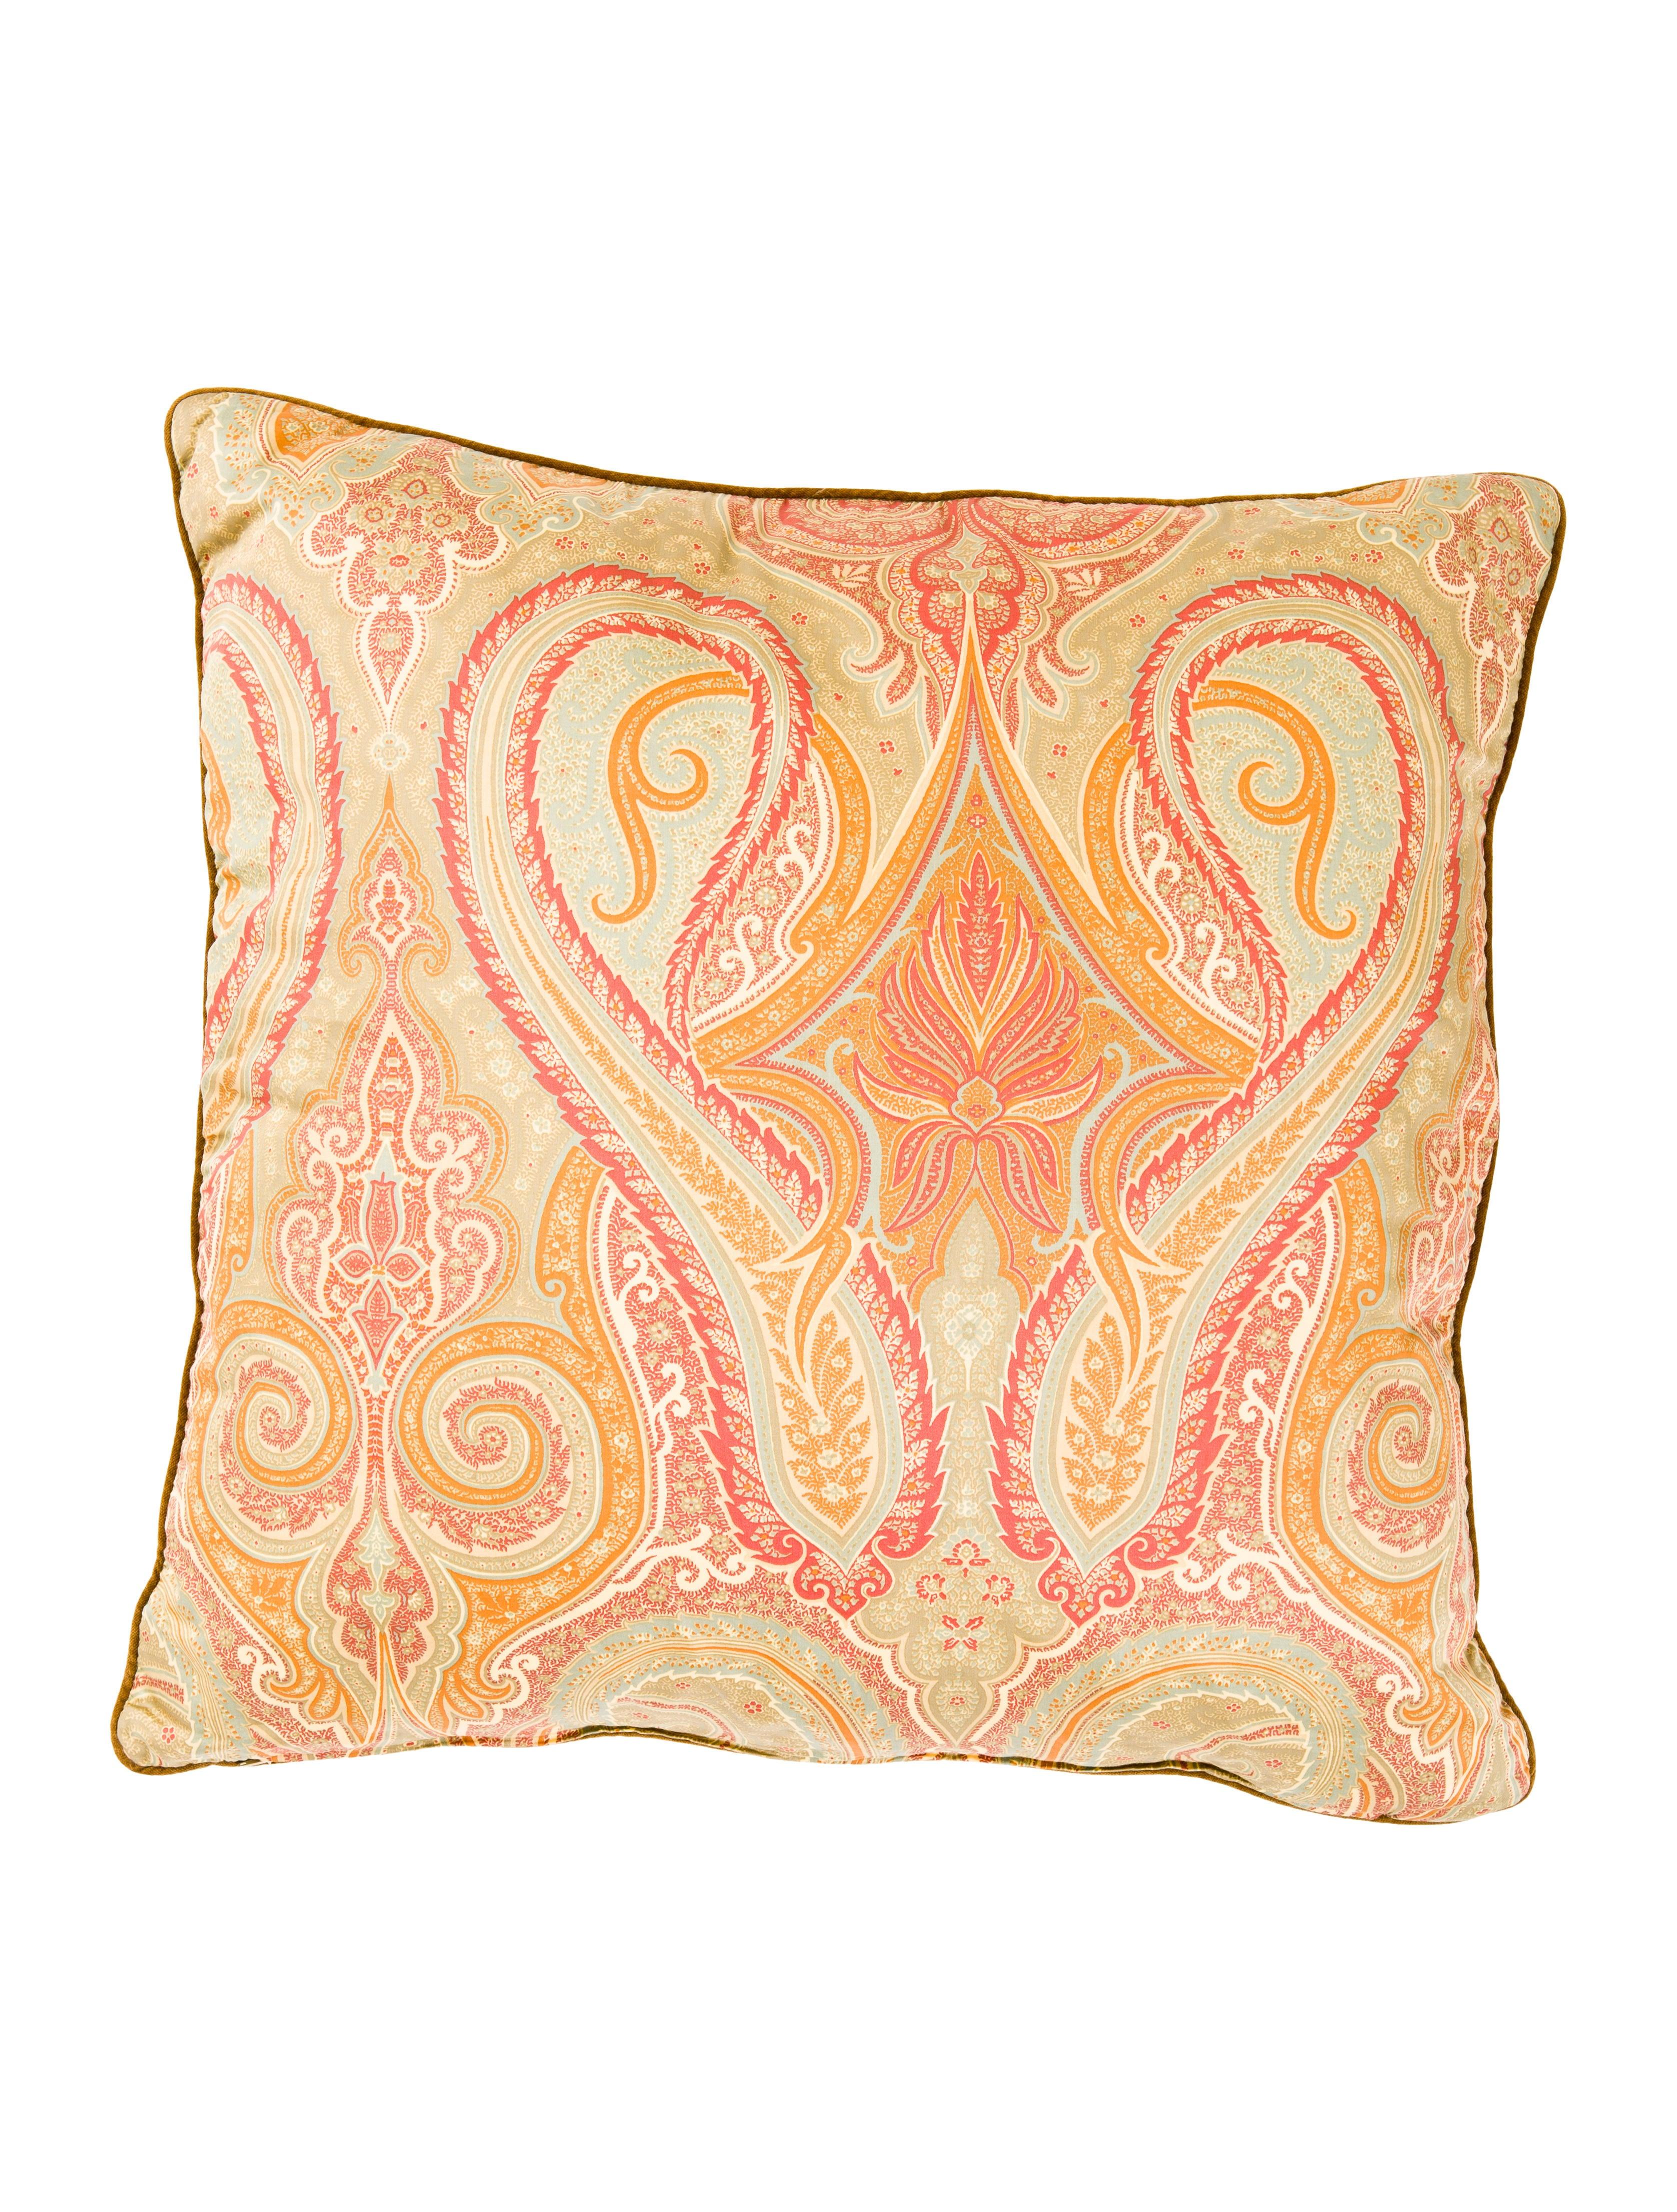 Throw Pillow That Says Home : Etro Home Throw Pillow - Pillows And Throws - ETH20046 The RealReal